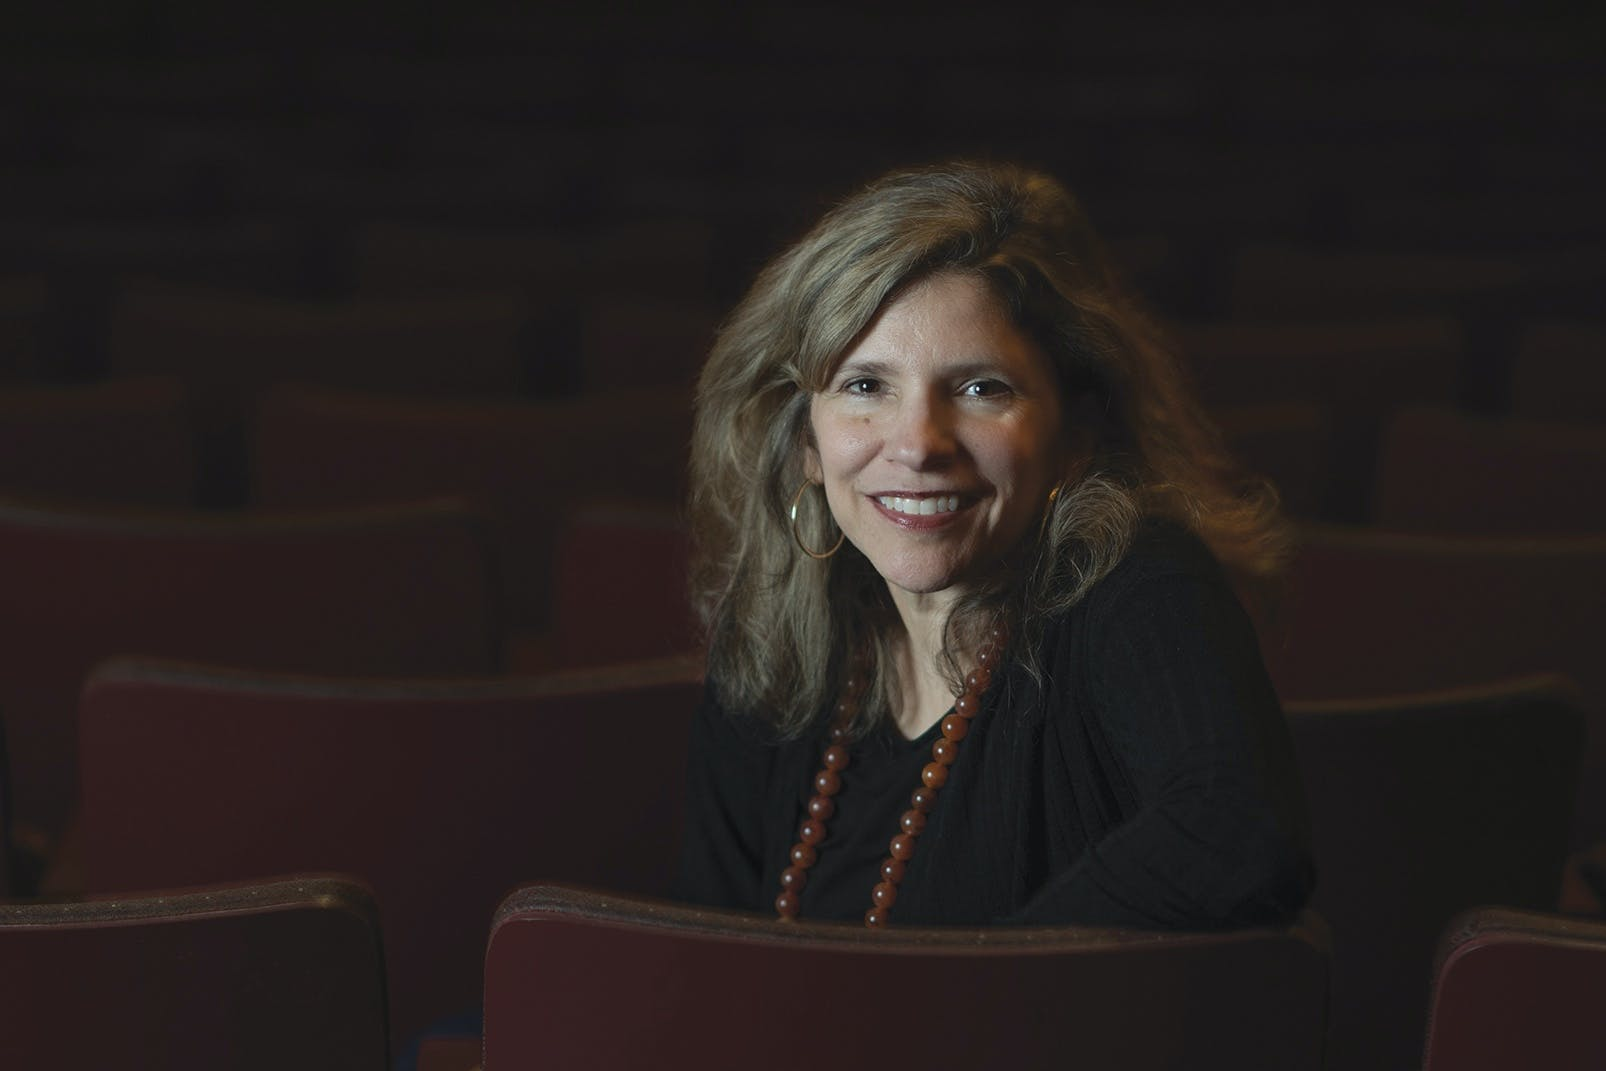 Angela Sabates